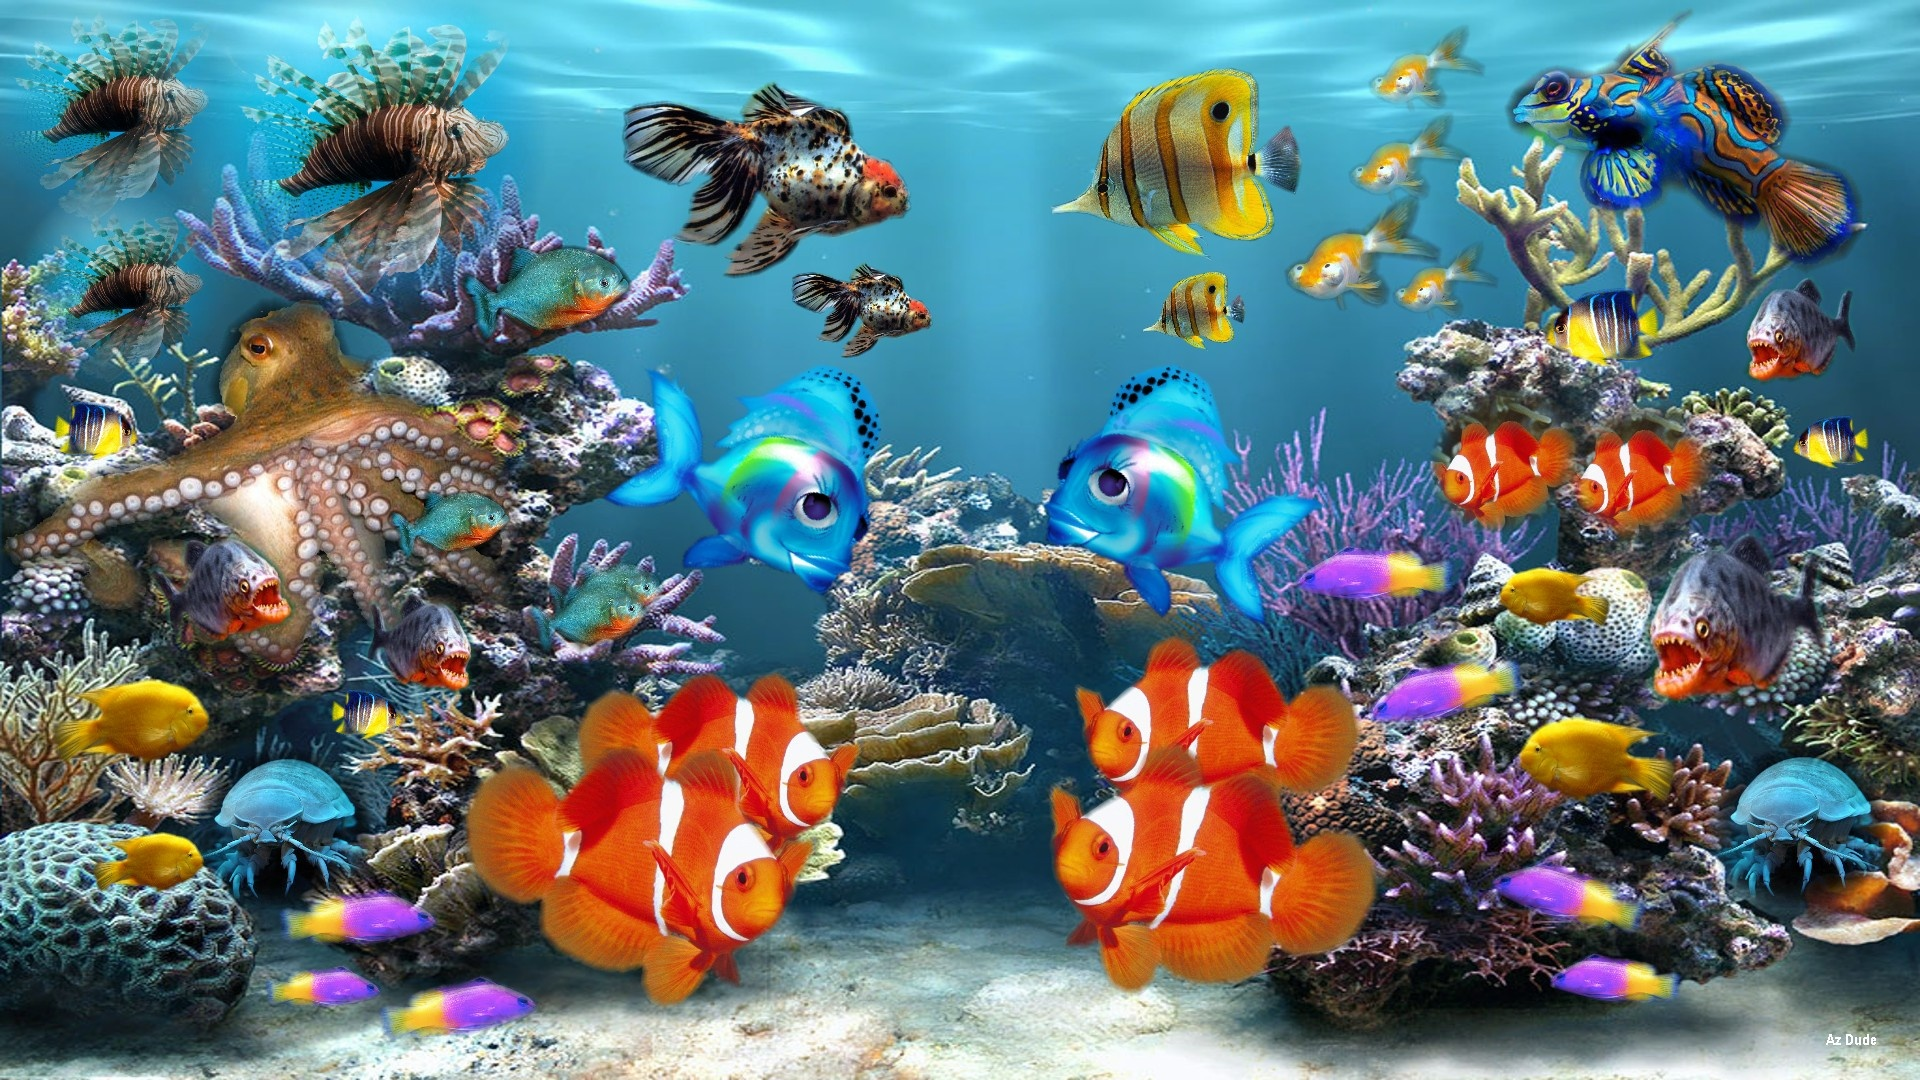 Fish aquarium screensaver - Fish Aquarium Video Screensaver Software Filedudes Com Filesize